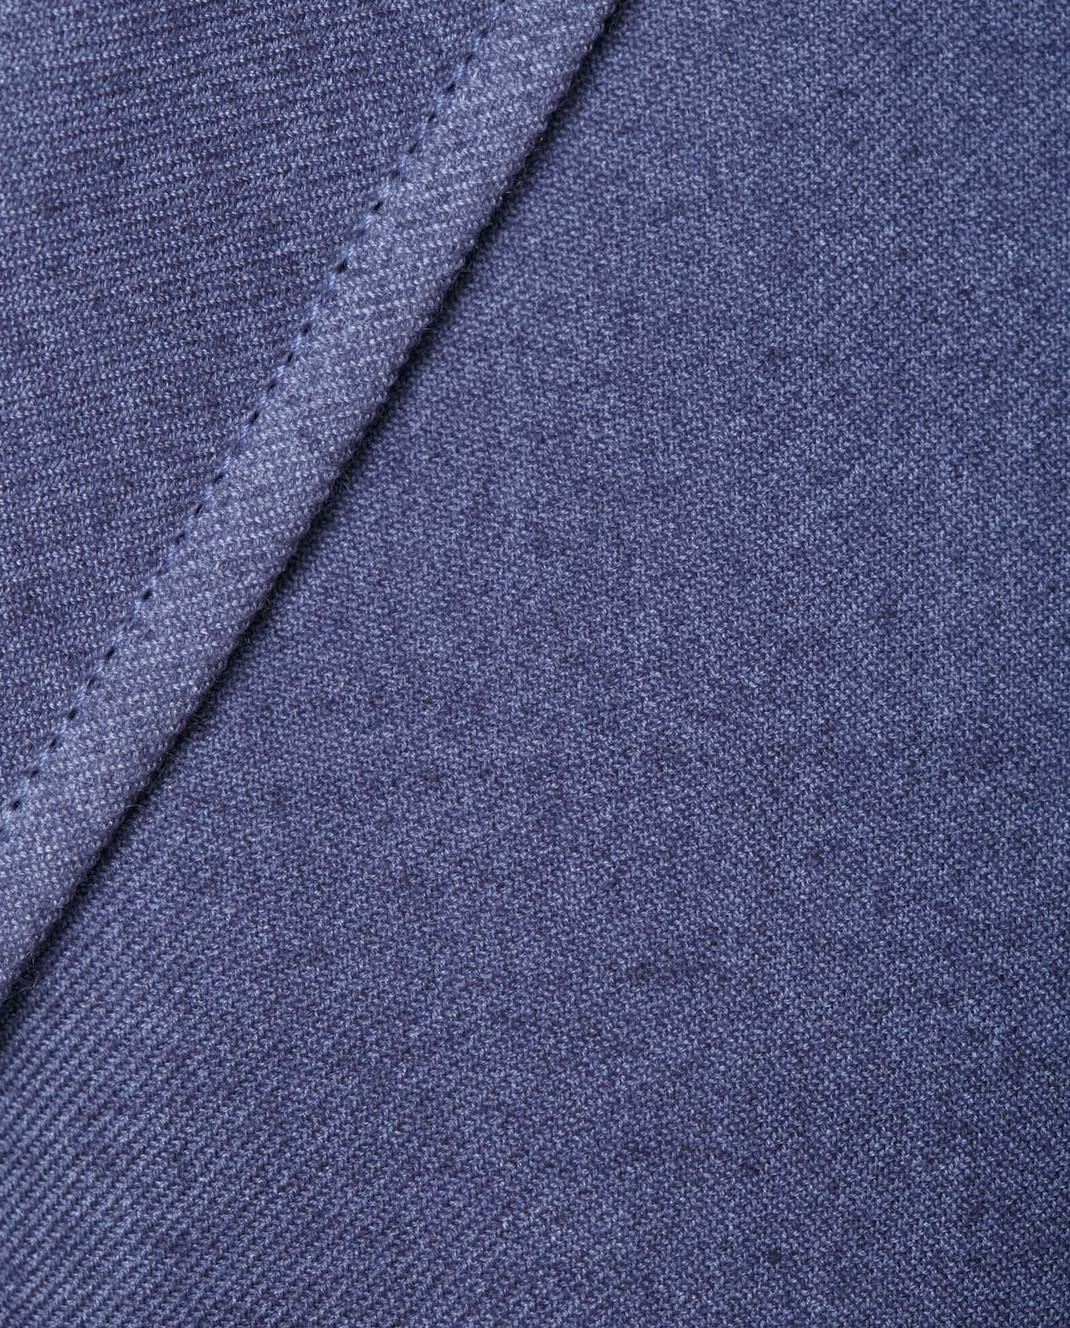 COLOMBO Синий жакет из кашемира и шелка GI00049 изображение 5